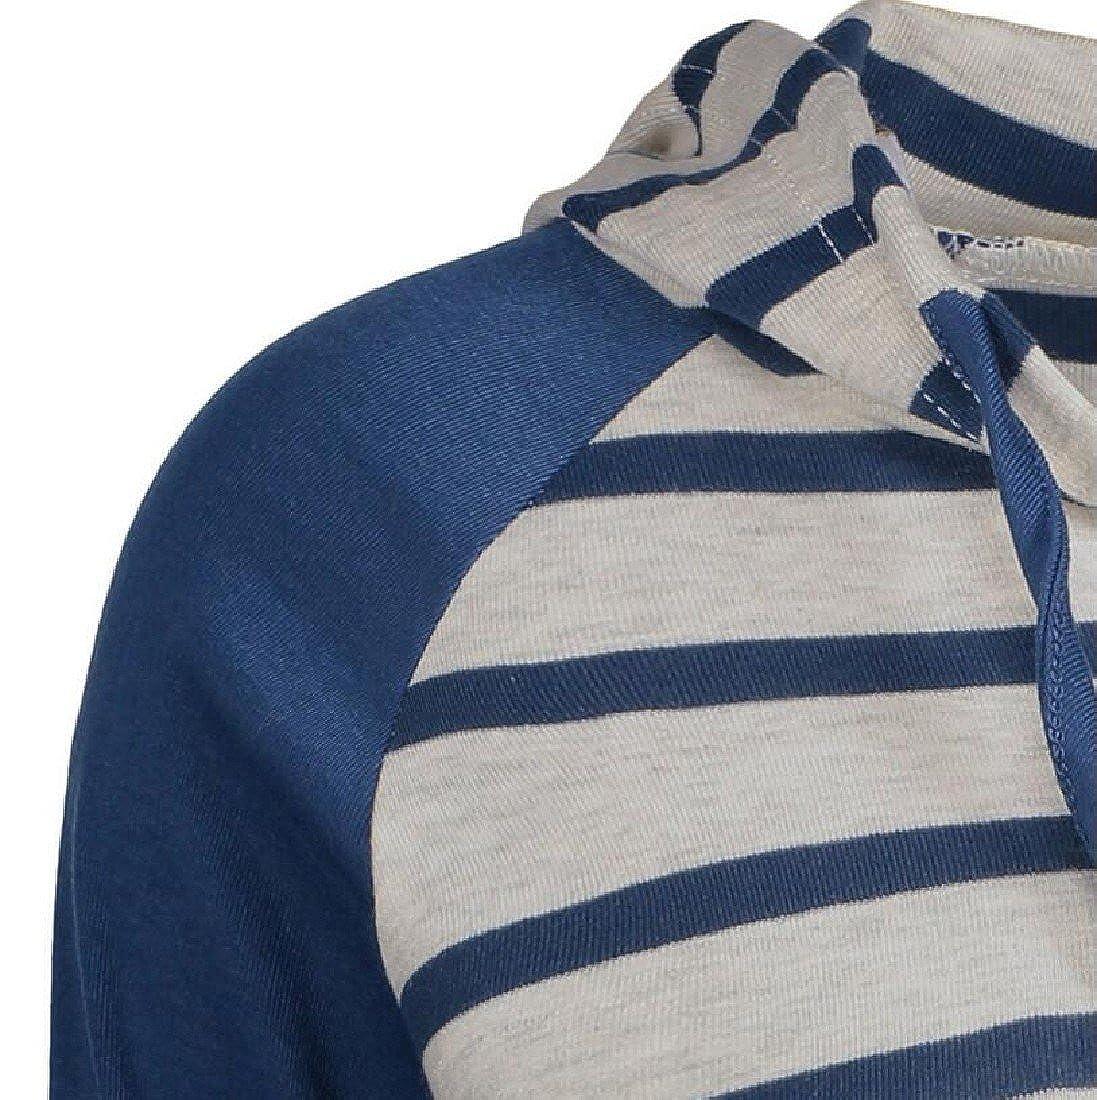 BabyYoung Womens Hoodie Stitching Sweatshirt Vogue Fit Striped Pullover